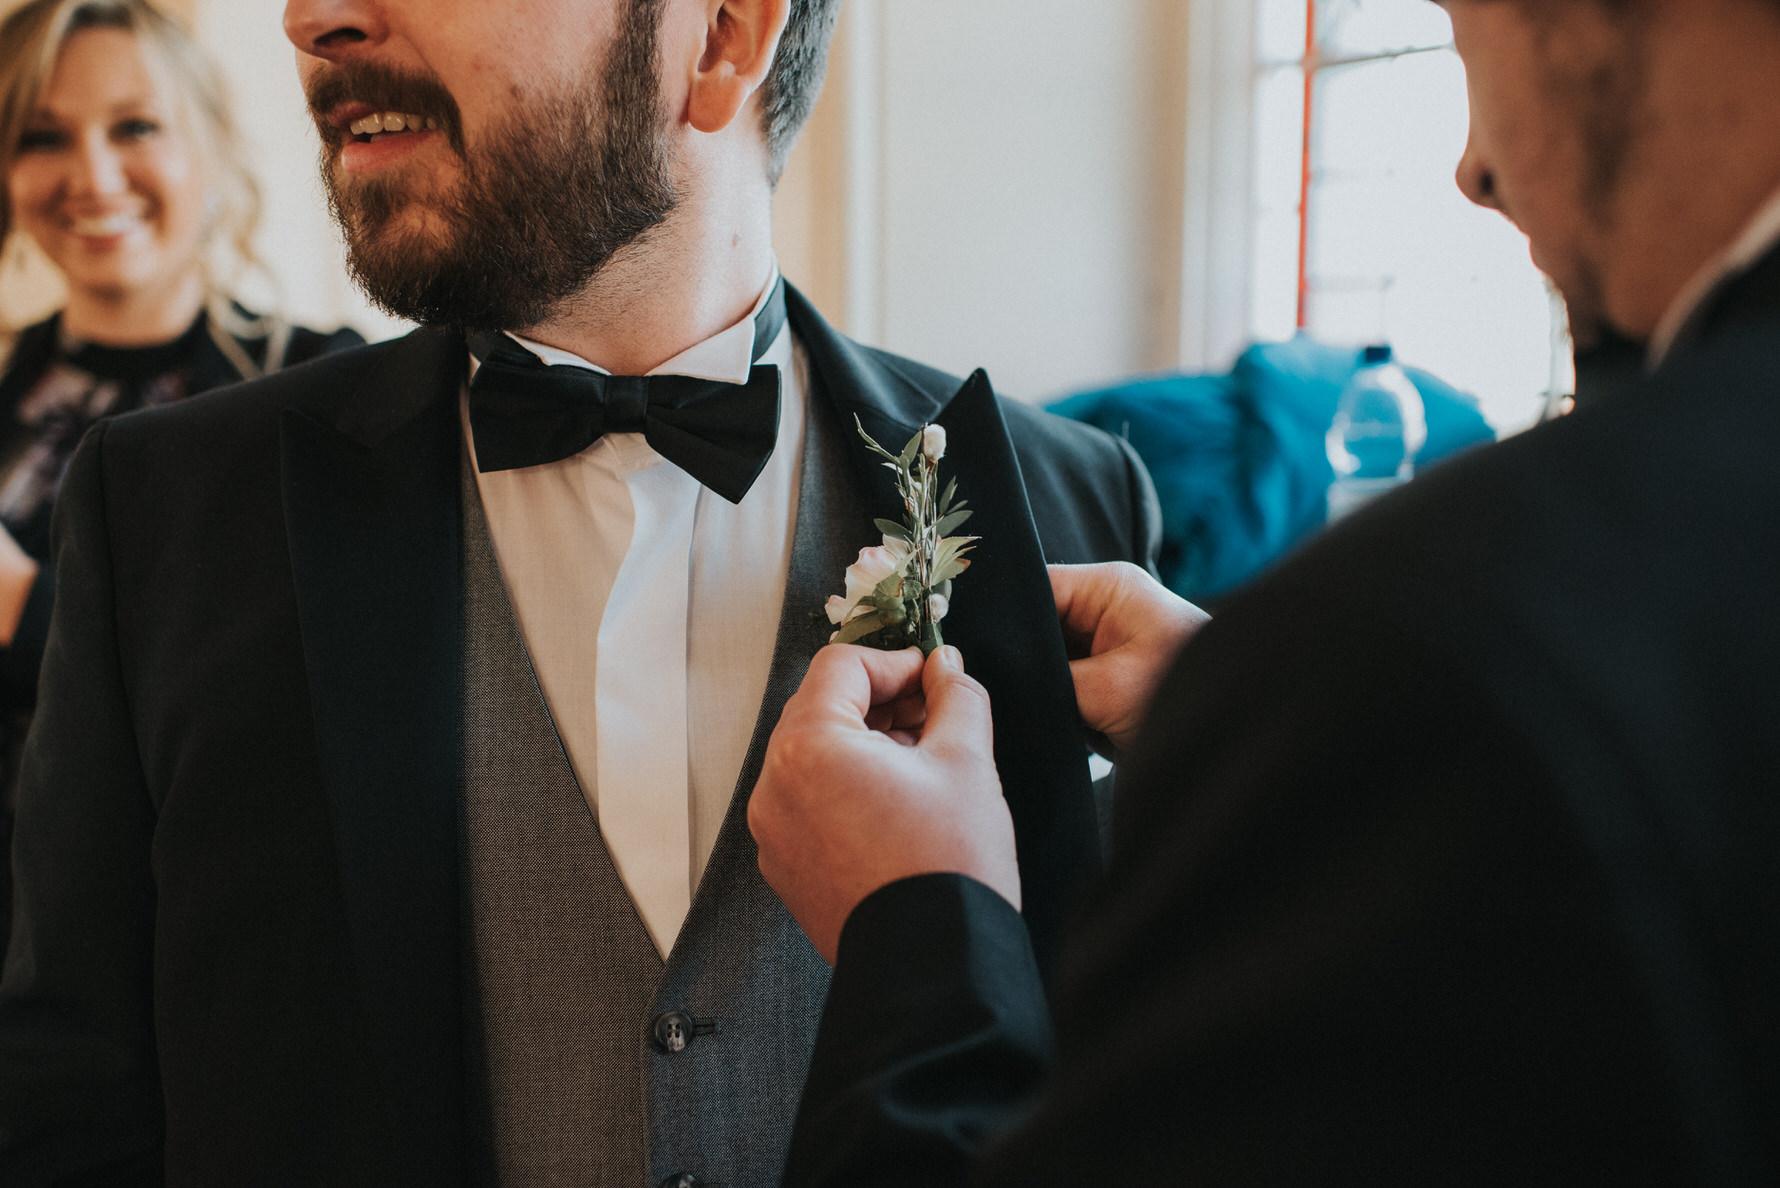 Wedding Photojournalism - Groomsman putting buttonhole on groom